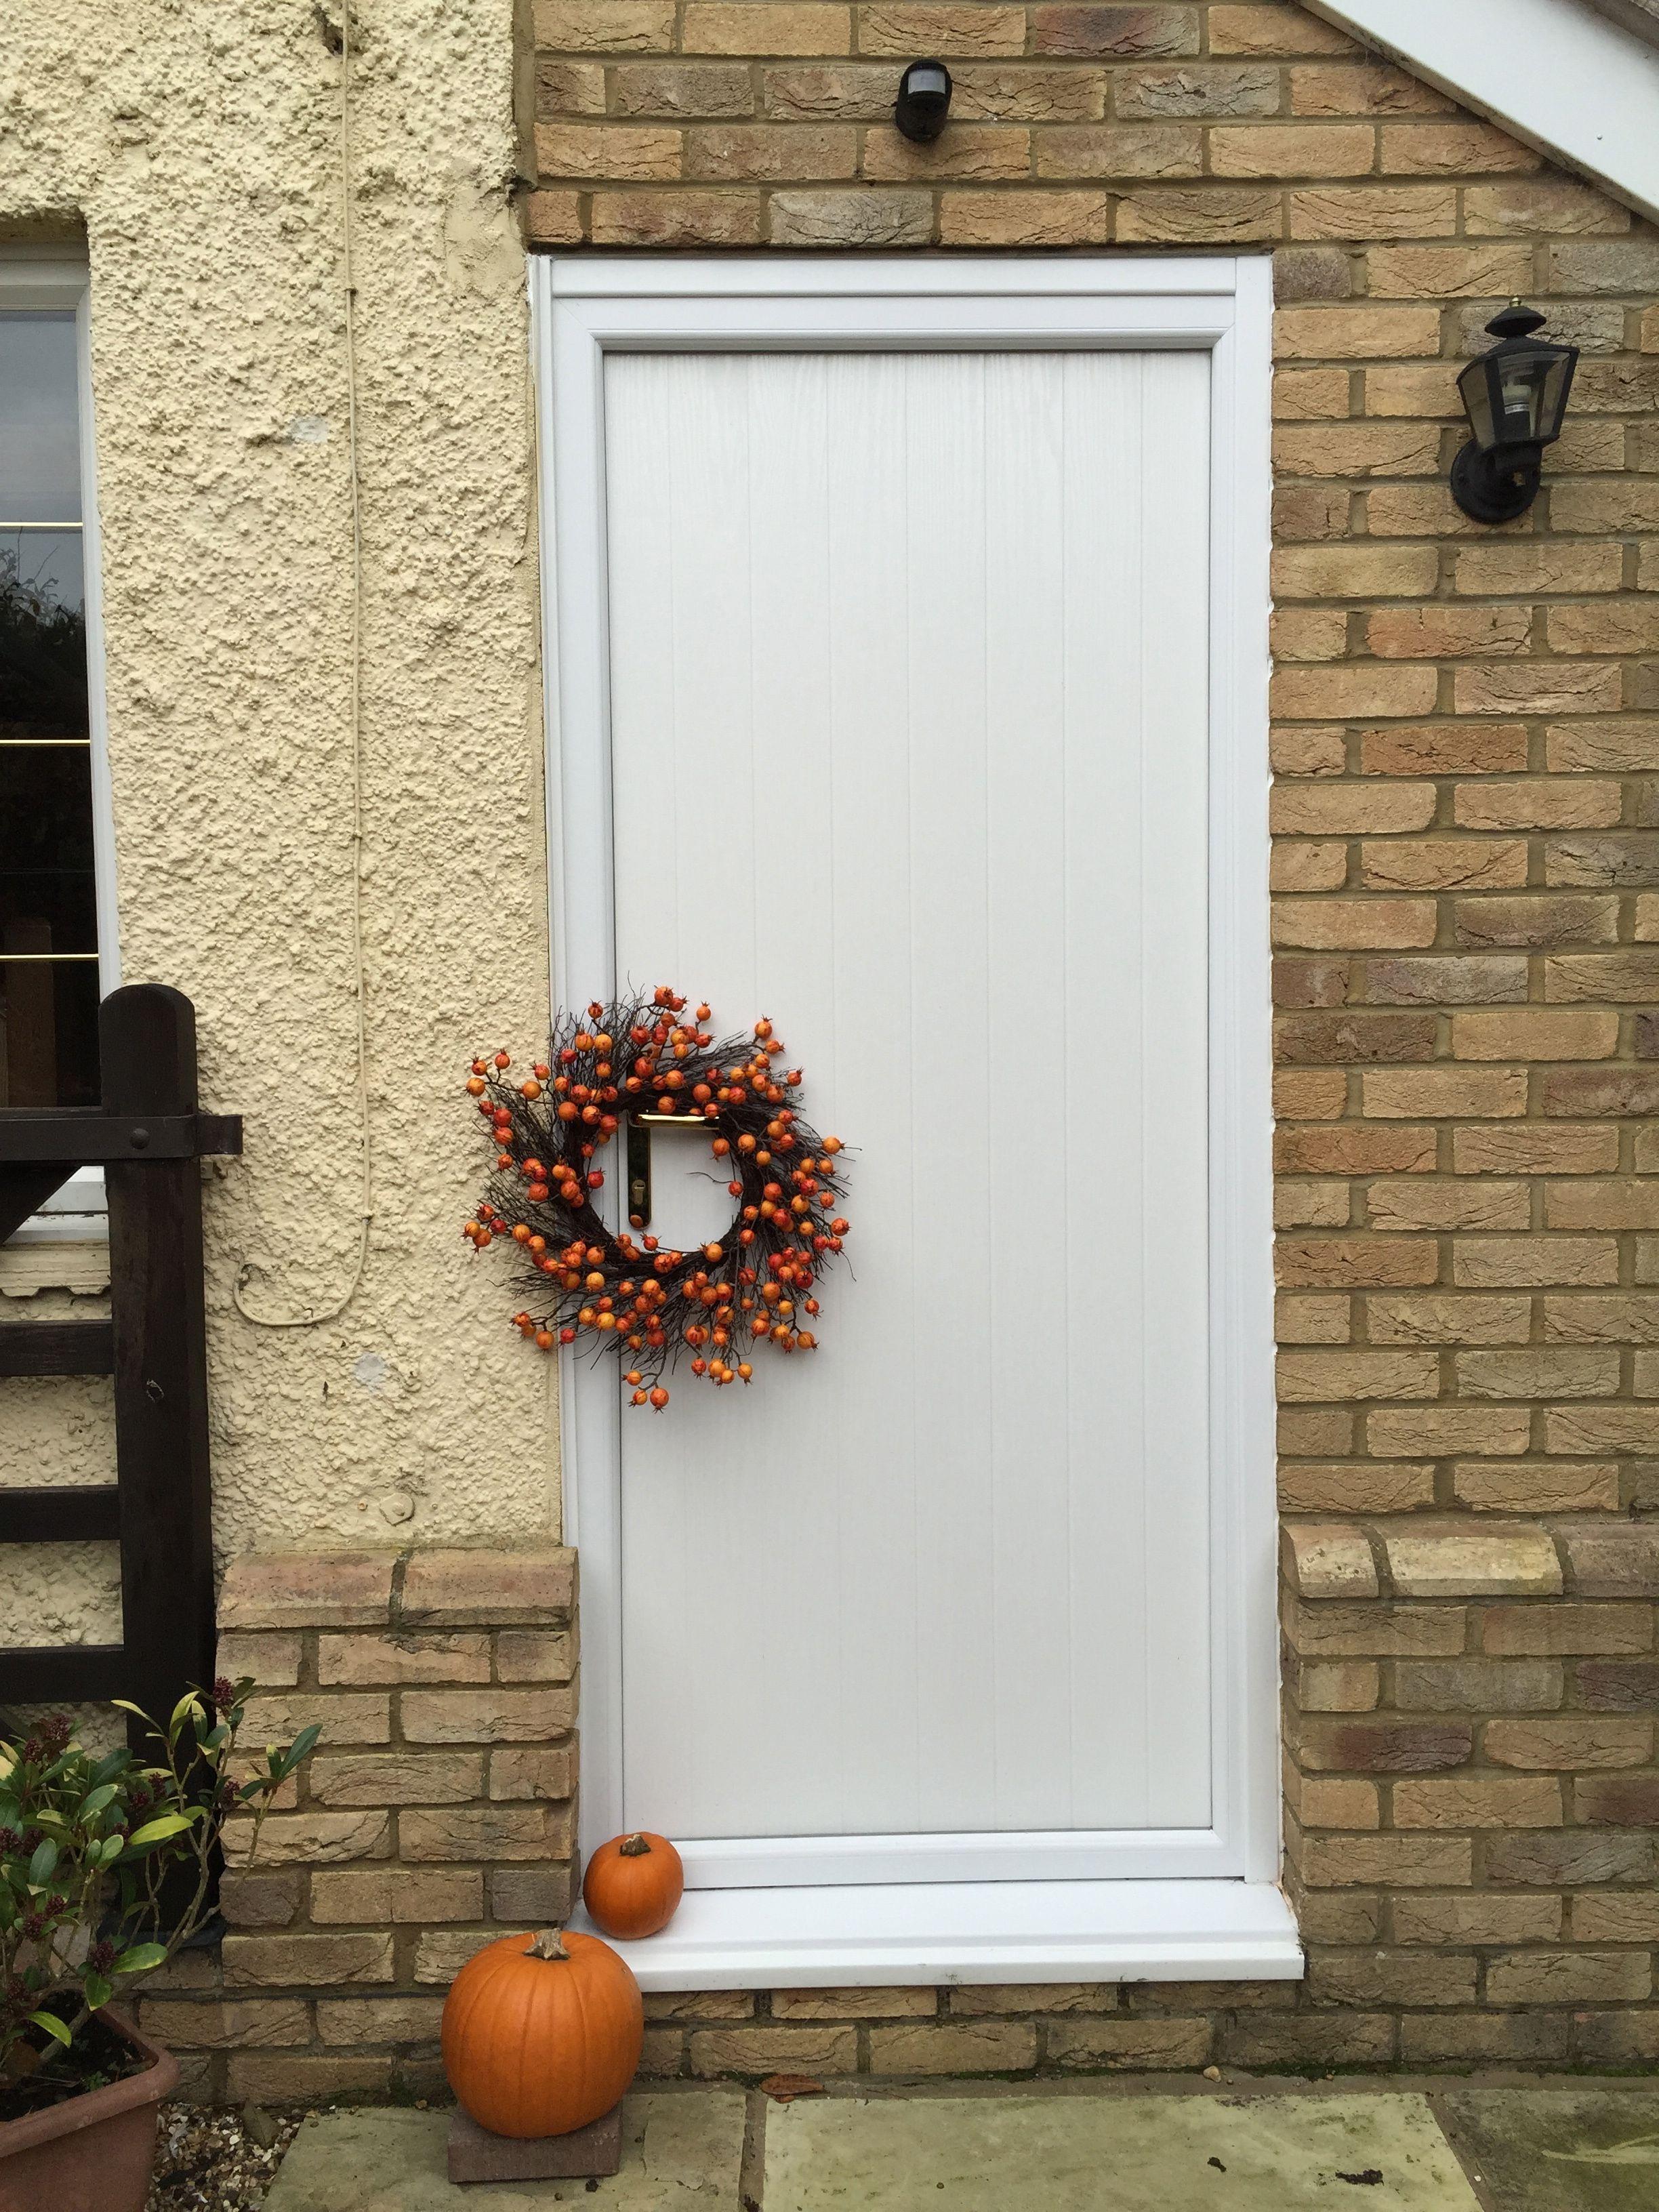 Halloween Decor Looks Stunning Against White Composite Door